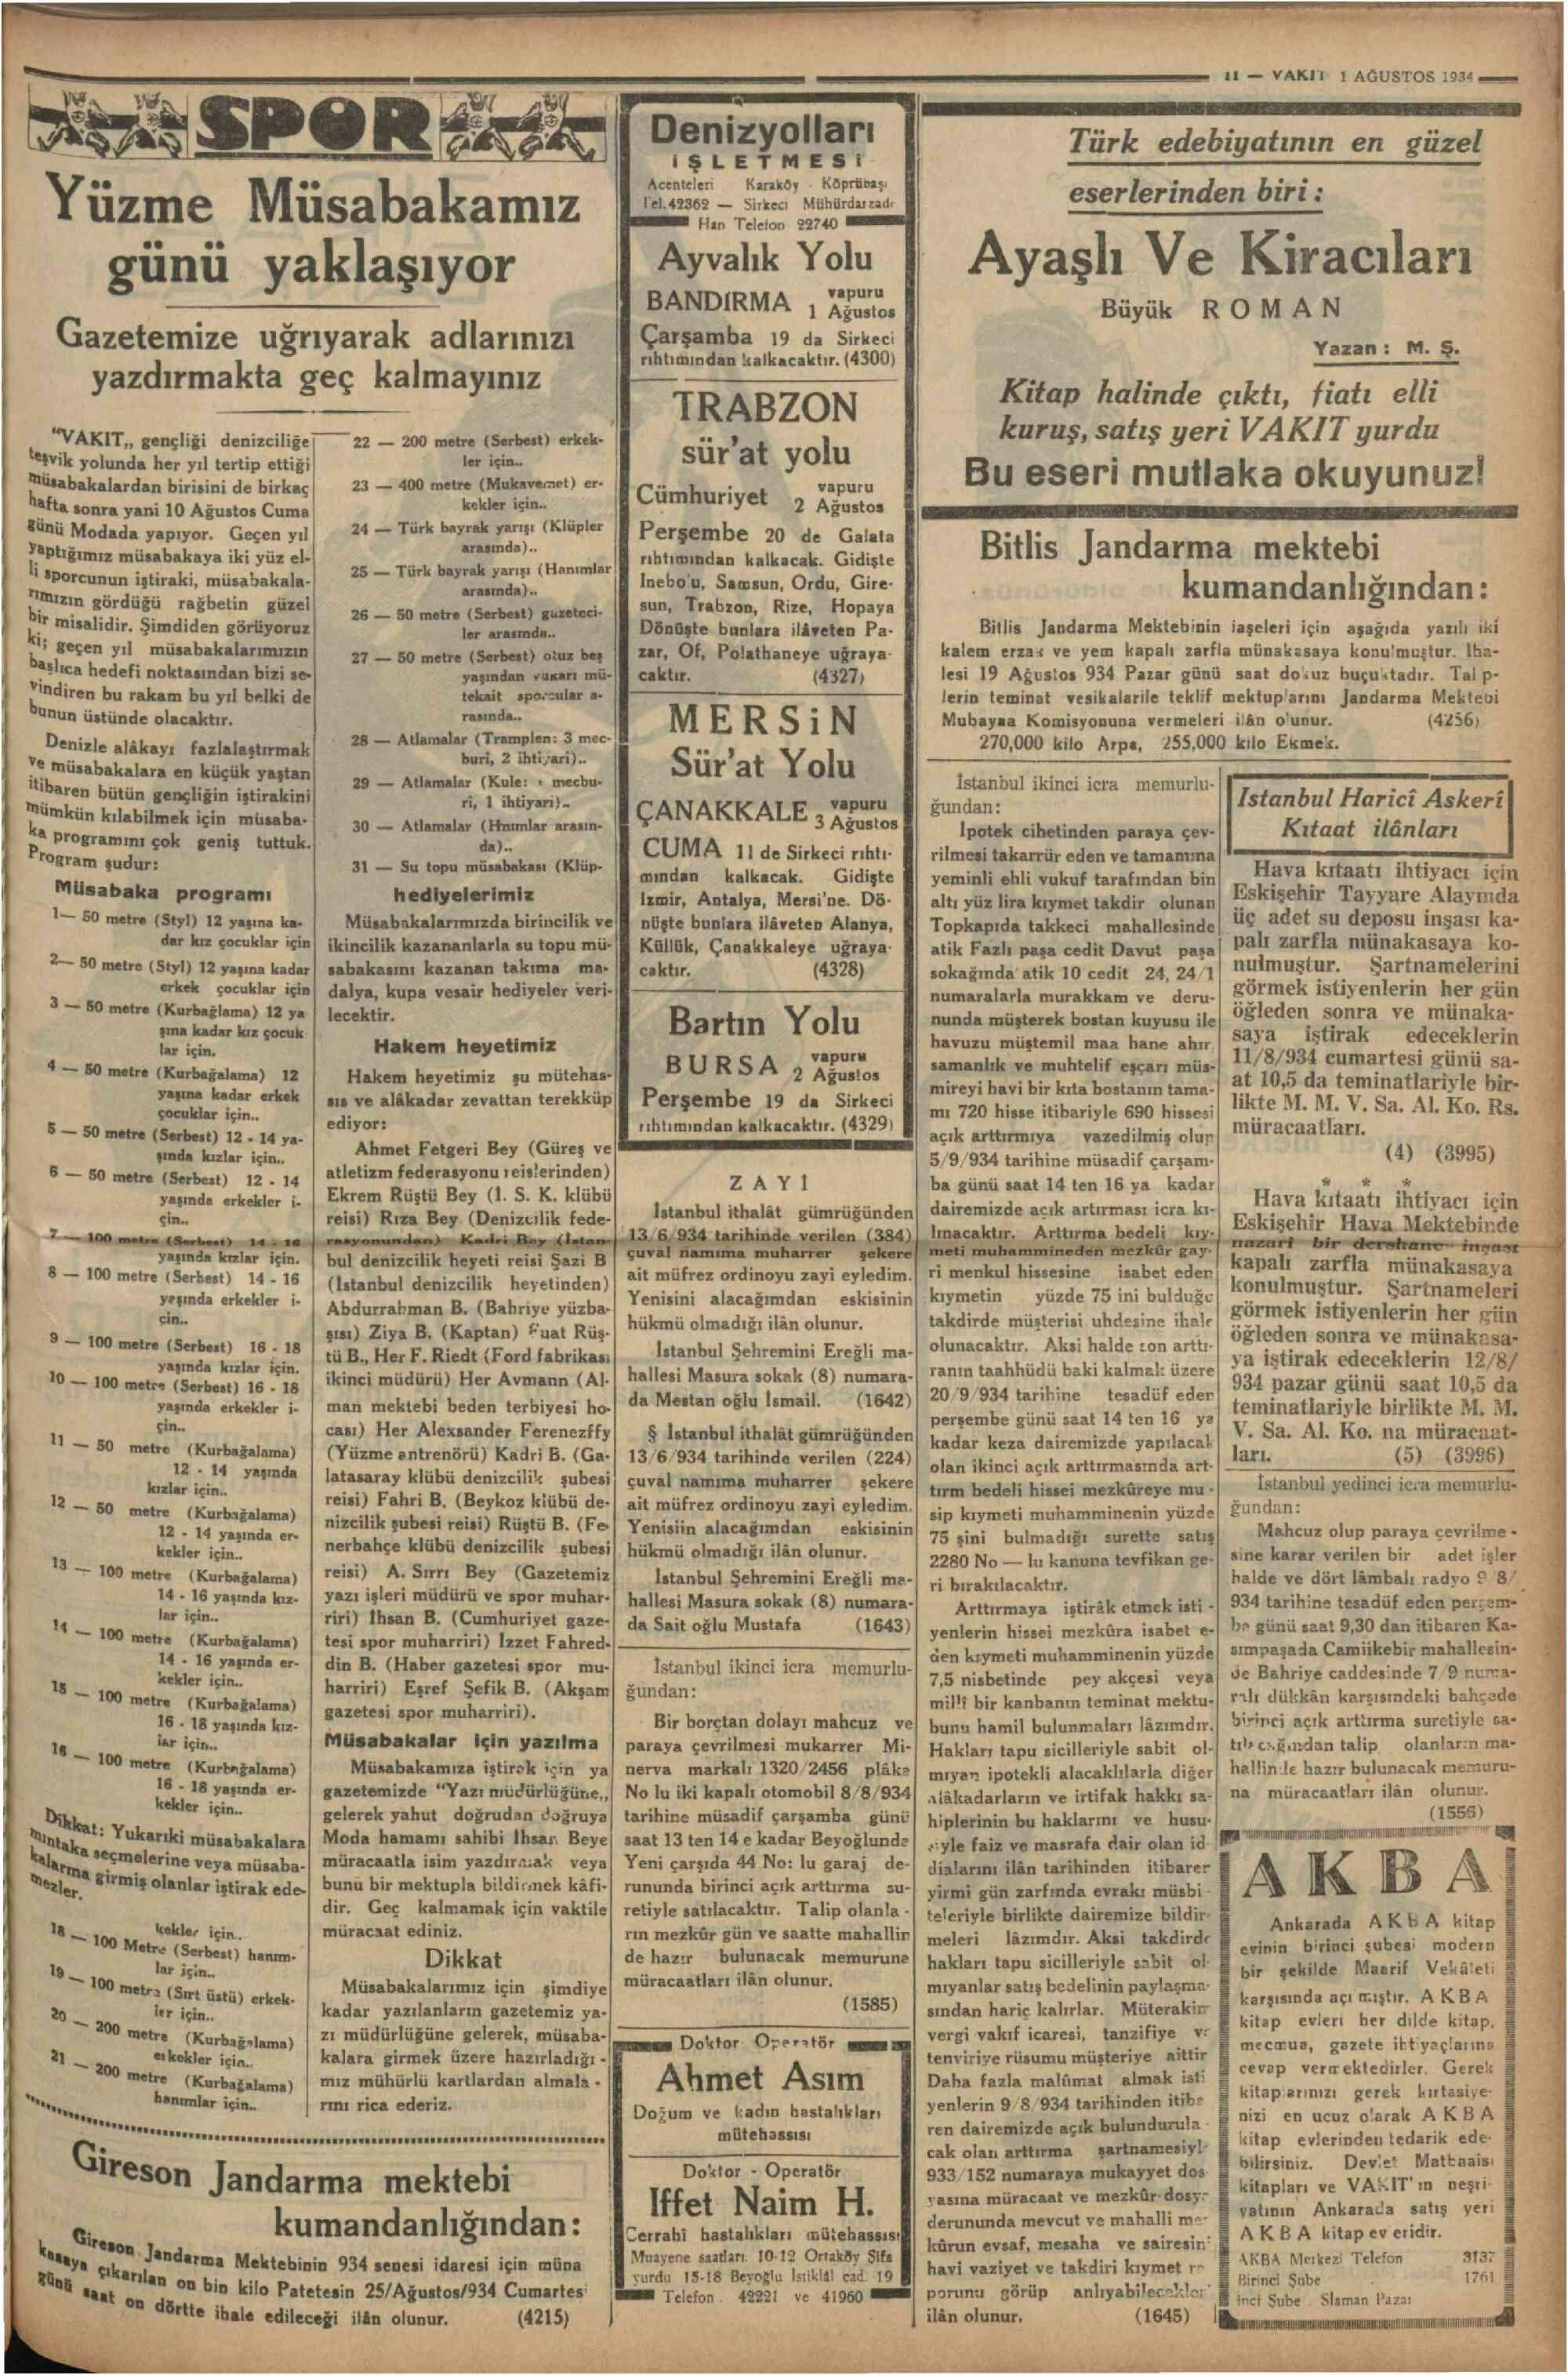 1 Ağustos 1934 Tarihli Vakit Dergisi Sayfa 11